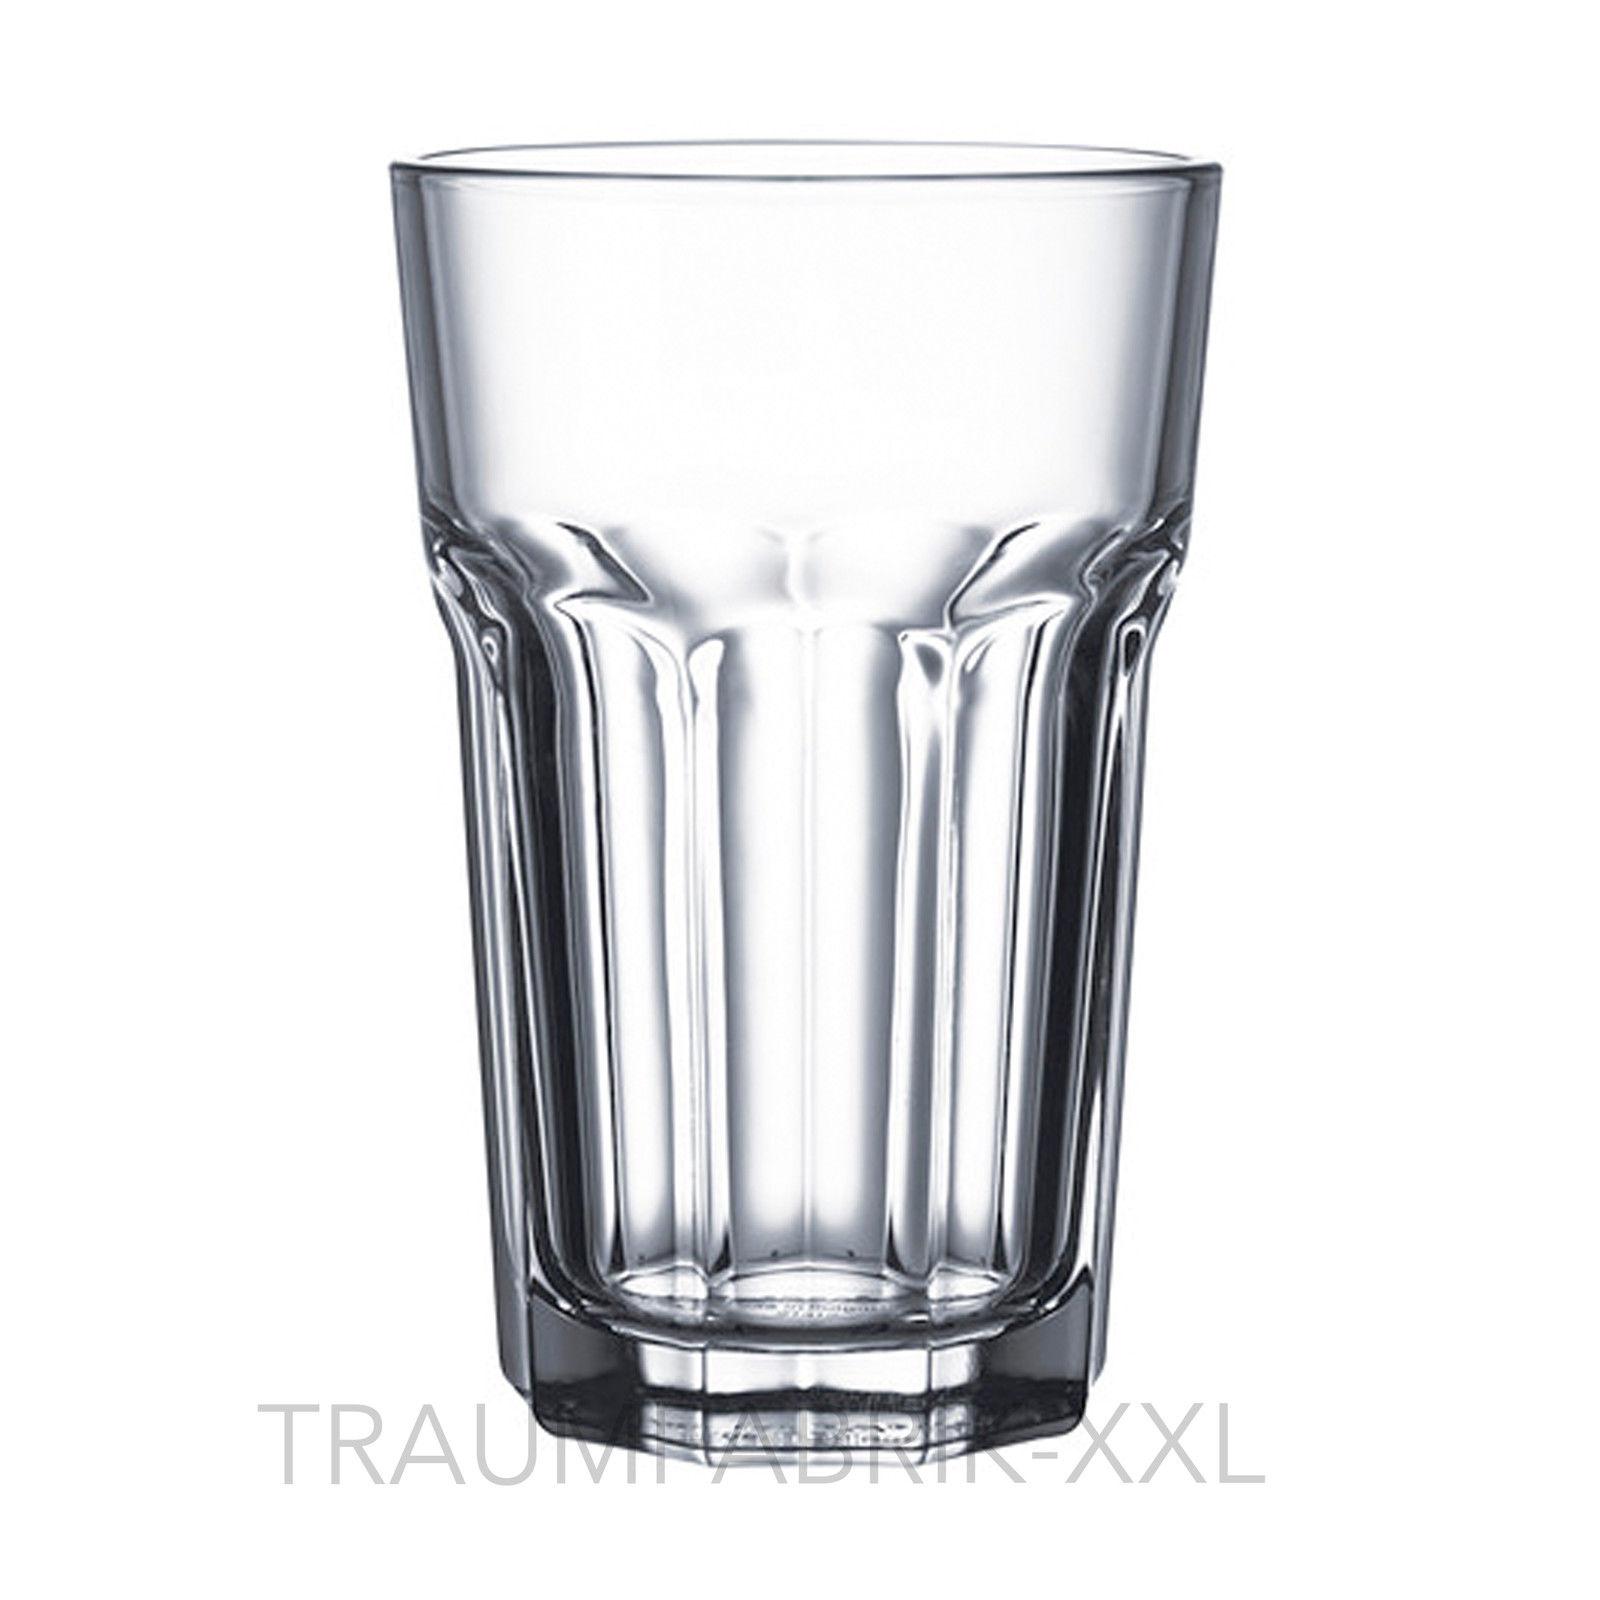 Cocktailgläser cocktailgläser gläser glas cocktailglas caipirinha caipirinhagläser